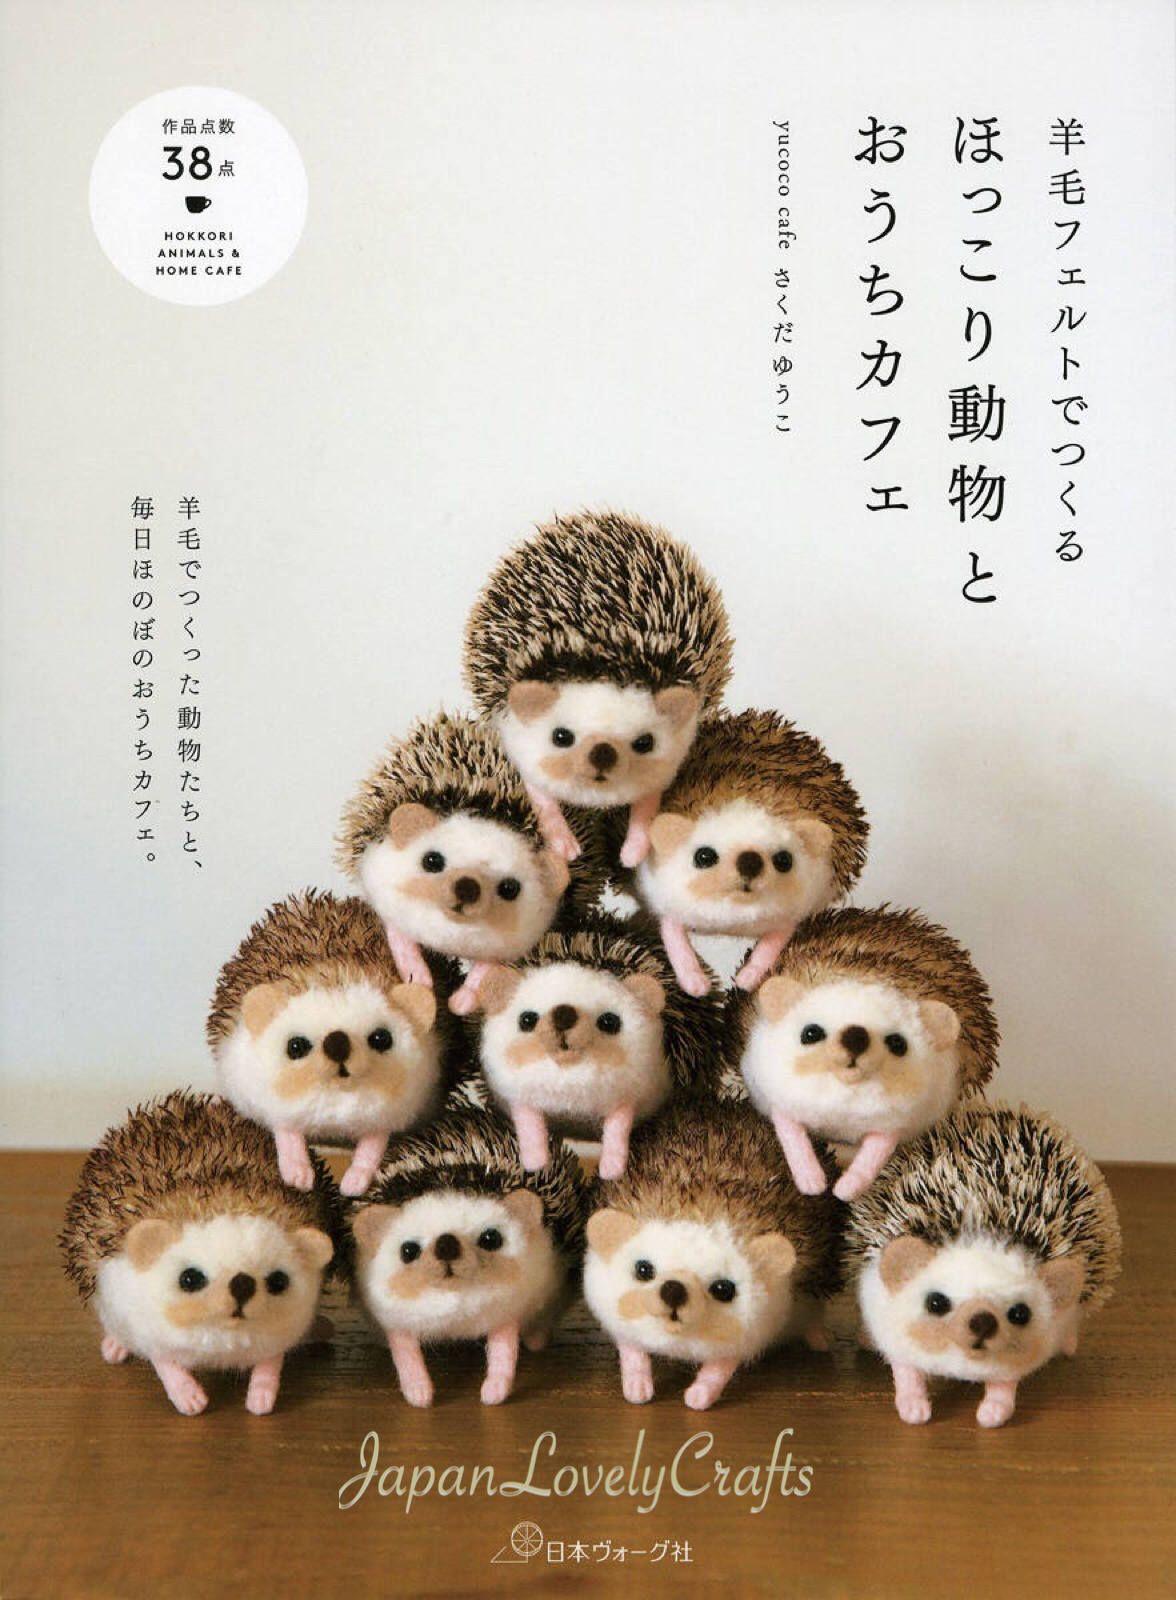 Kawaii wool felt bird doll patterns japanese needle felting | etsy.